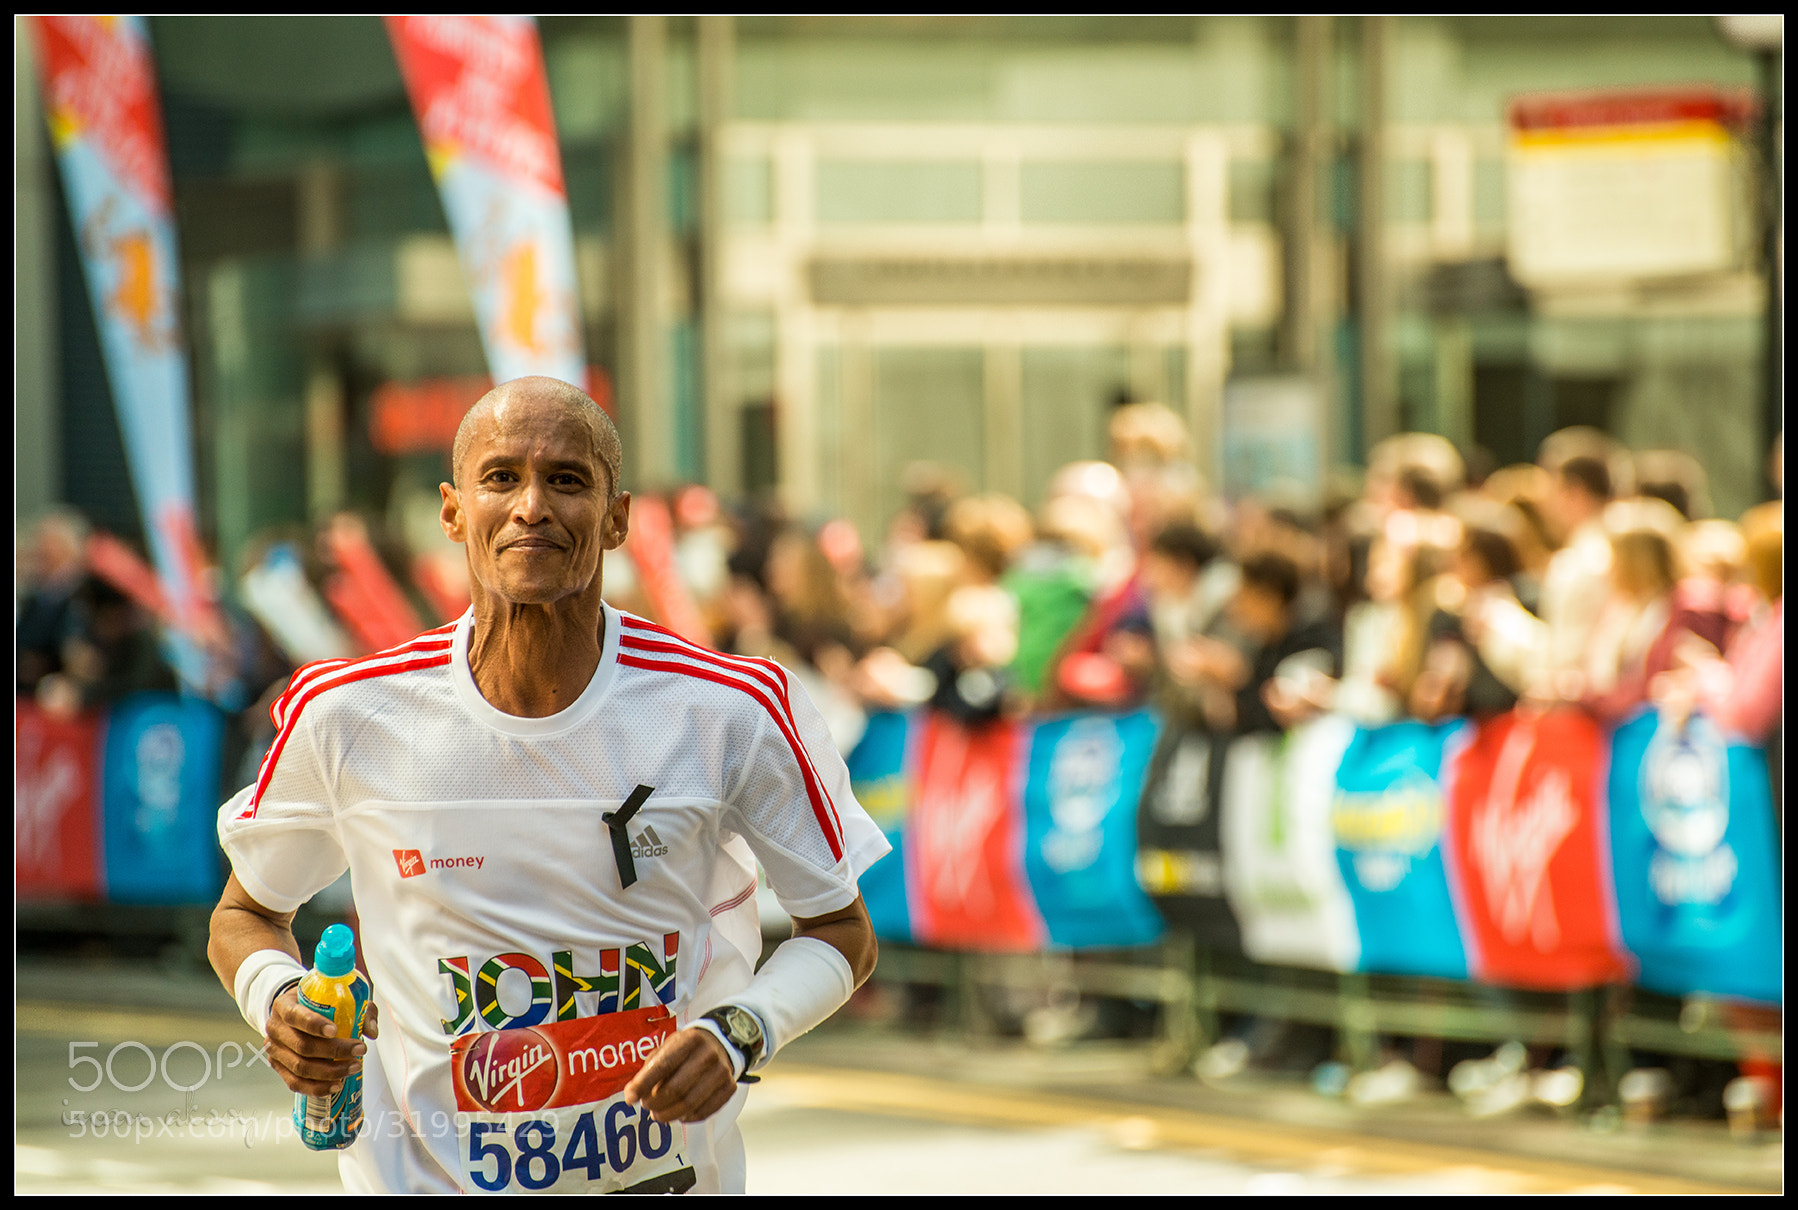 Photograph London Marathon 2013 by Inan Aksoy on 500px